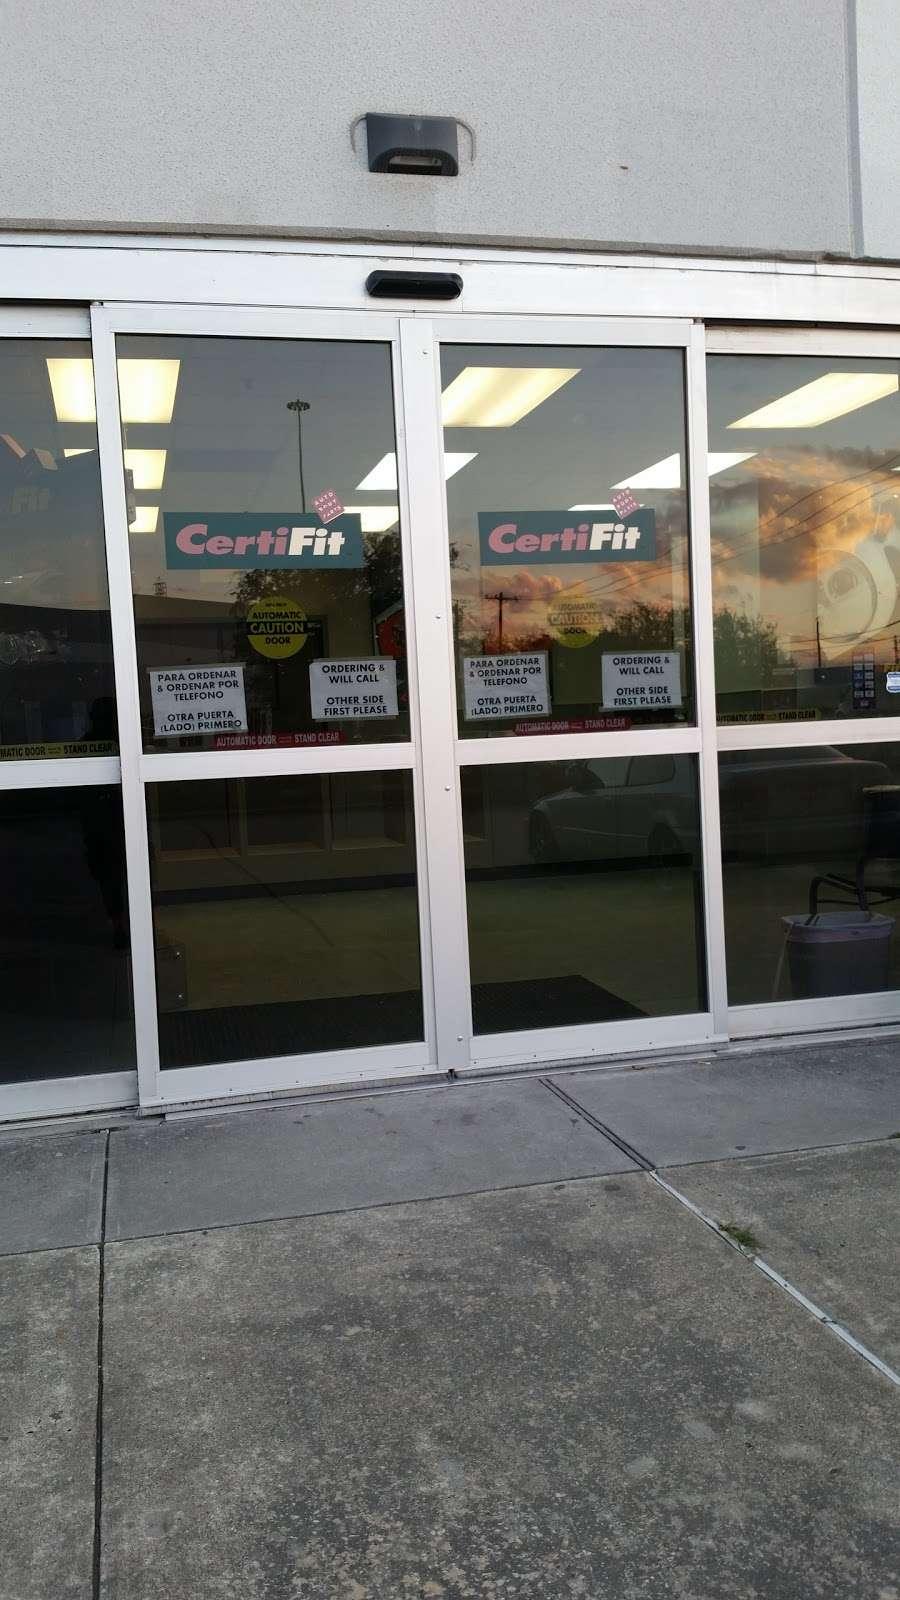 Certifit Auto Body Parts - car repair  | Photo 2 of 10 | Address: 8307 N. Loop East 610, Houston, TX 77029, USA | Phone: (713) 672-2100